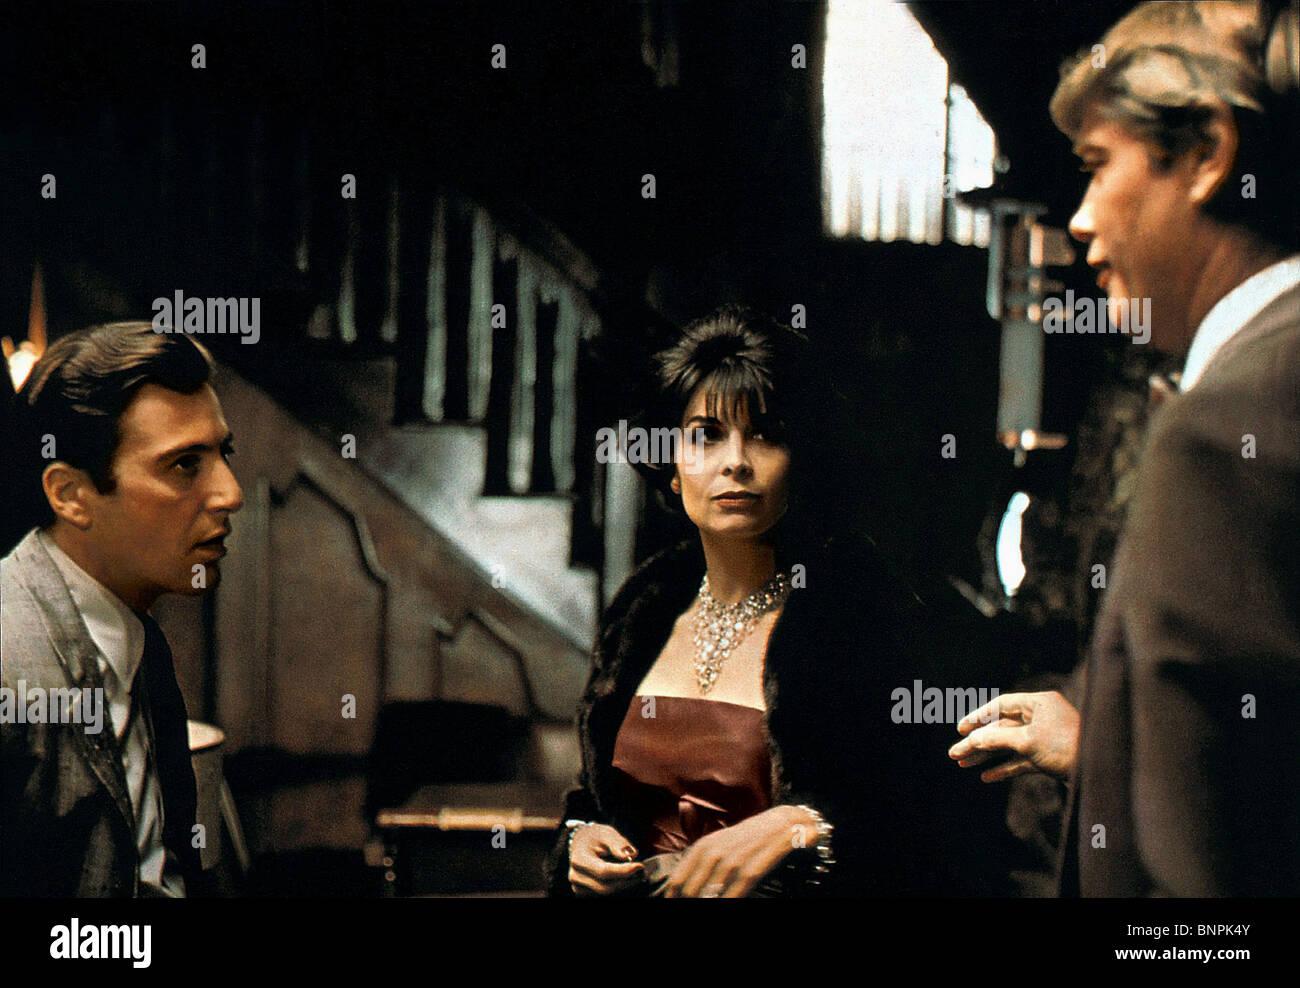 Al Pacino Talia Shire Der Pate Teil Ii 1974 Stockfoto